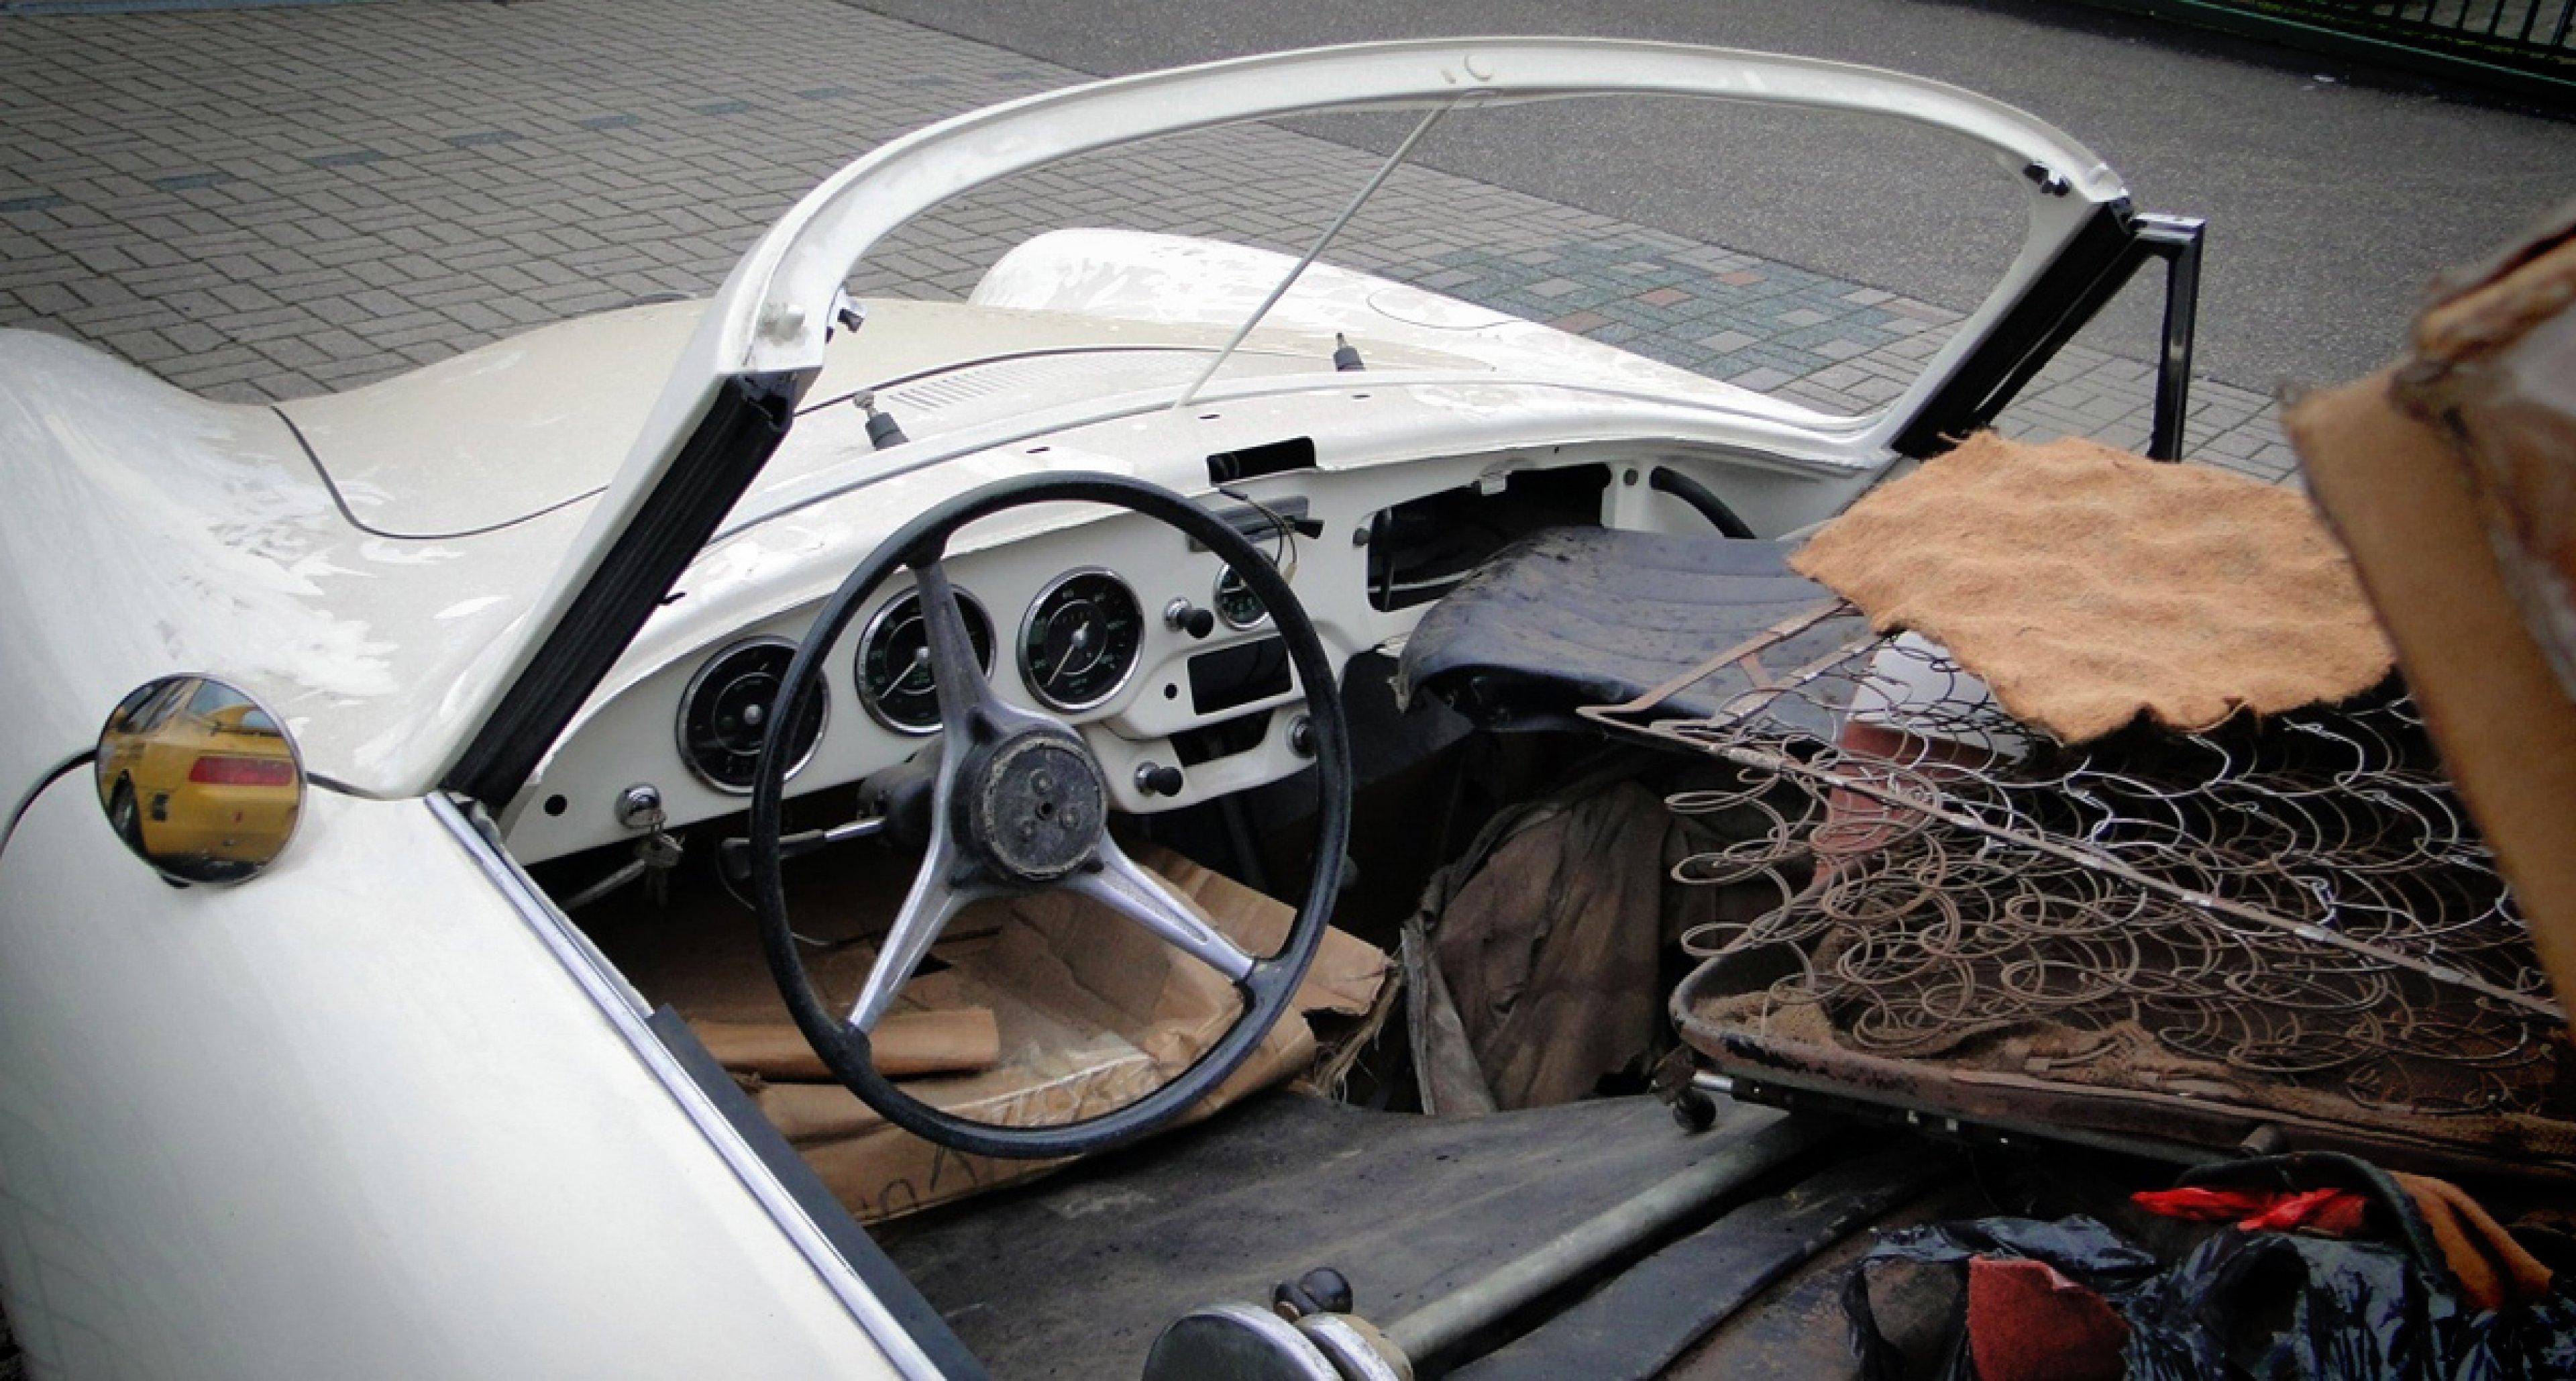 1965 Porsche 356 SC Cabriolet Restoration Project